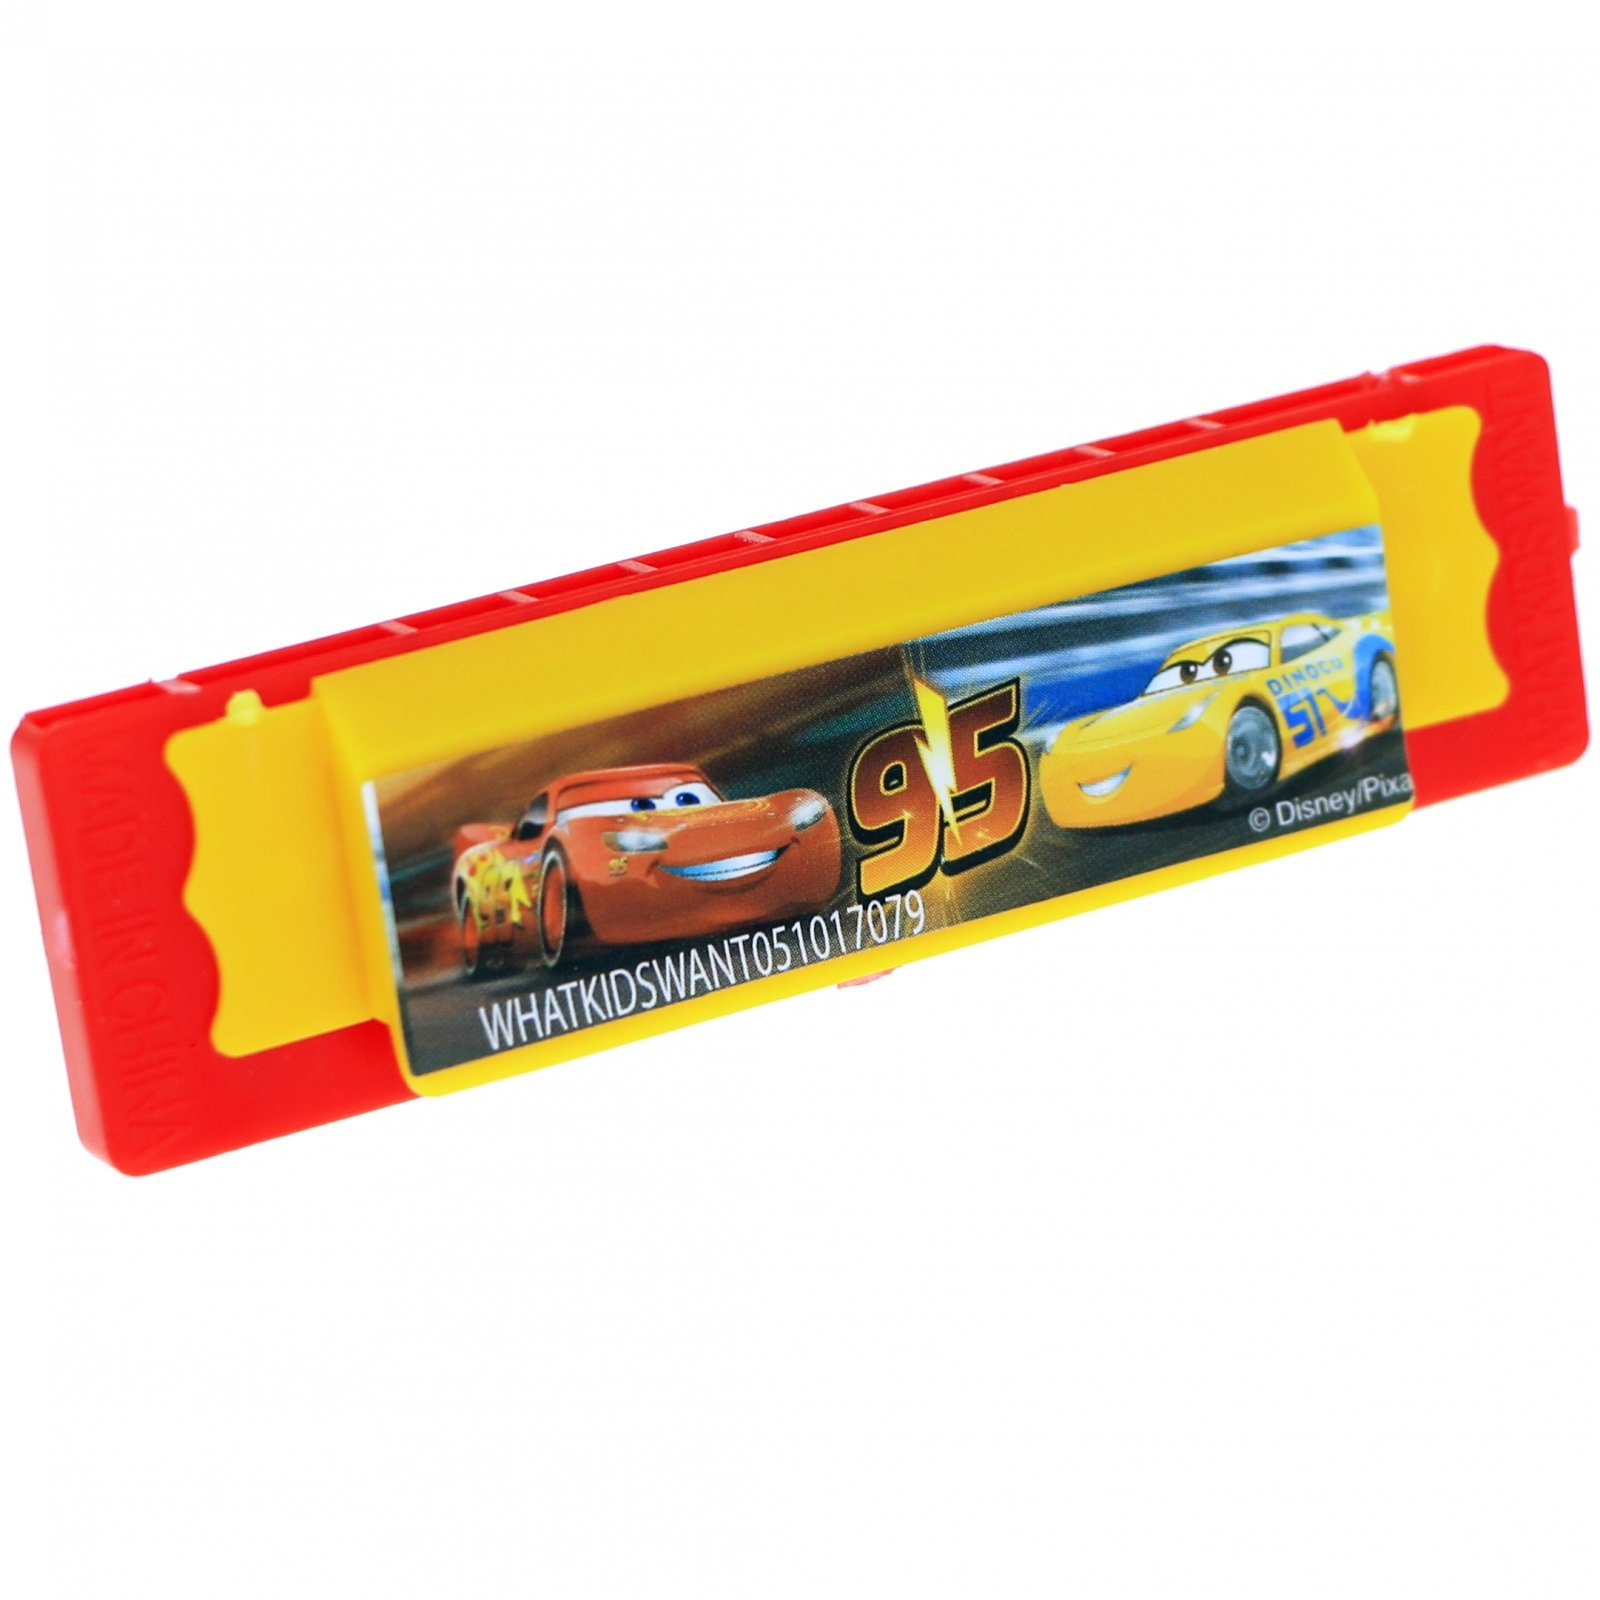 Disney Pixar Cars 3 Mini Harmonicas Kids Musical Instrument Toys 4 Pack - Red